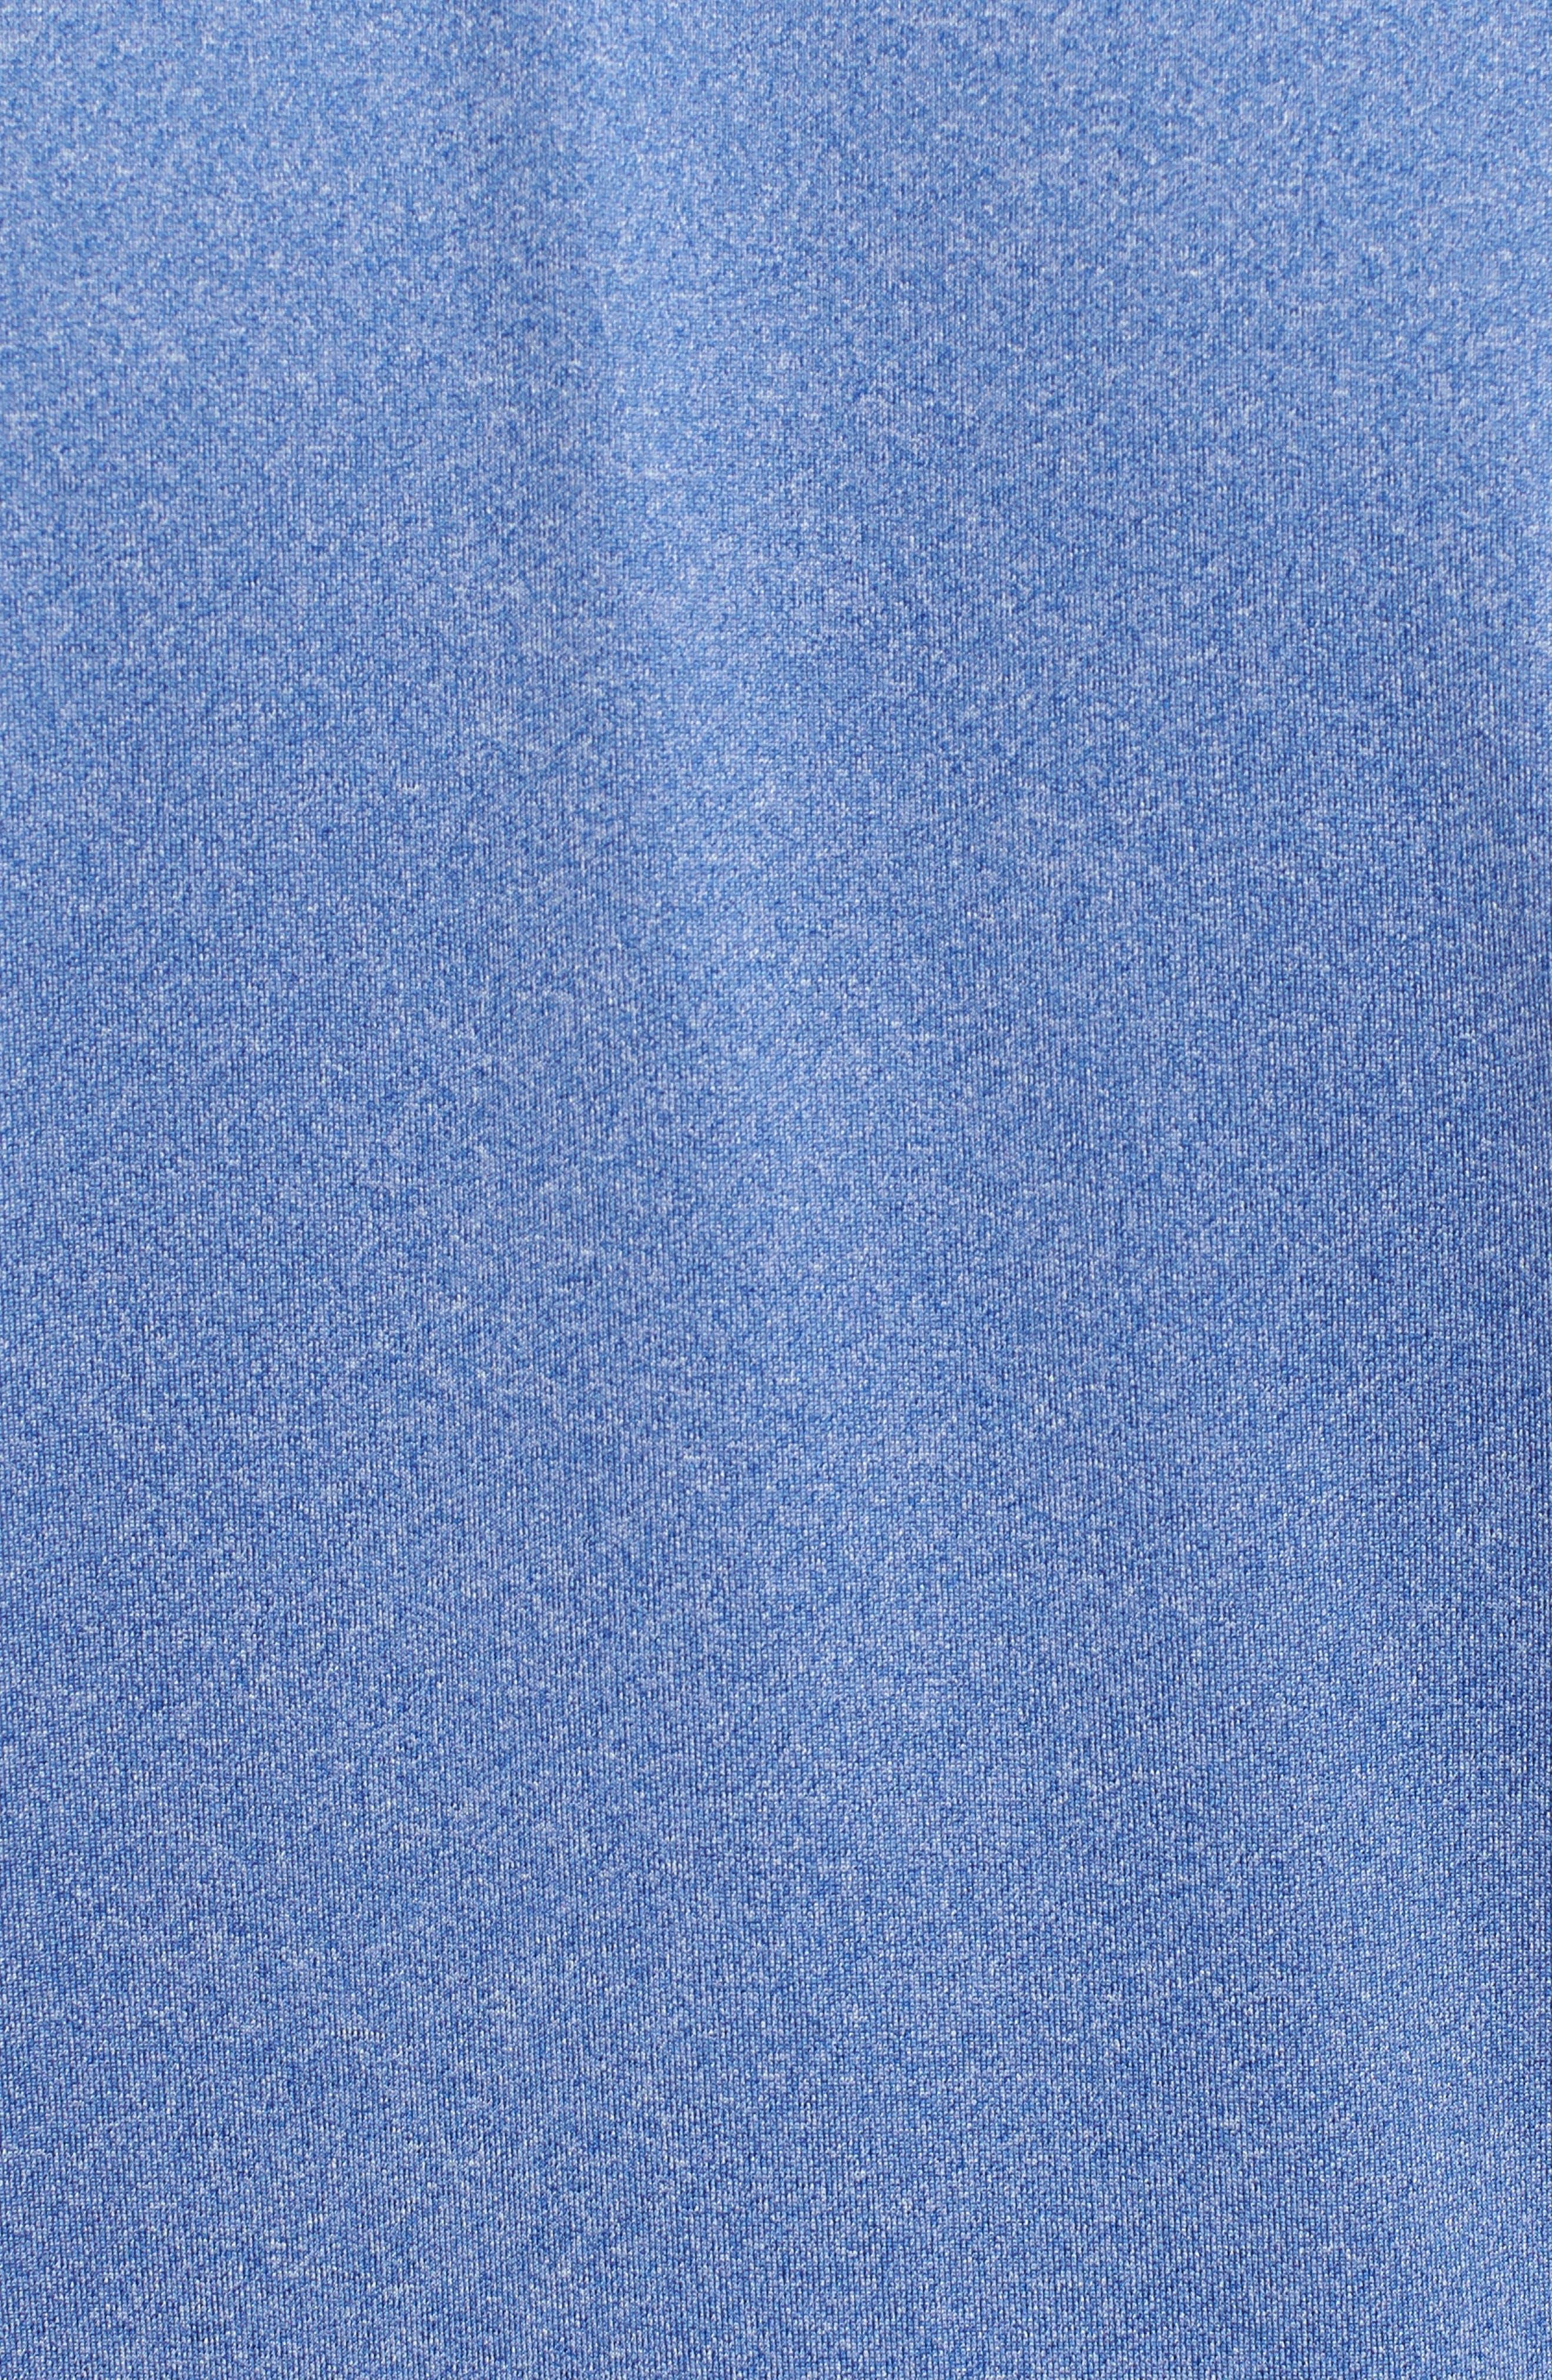 Endurance New York Giants Regular Fit Pullover,                             Alternate thumbnail 5, color,                             TOUR BLUE HEATHER